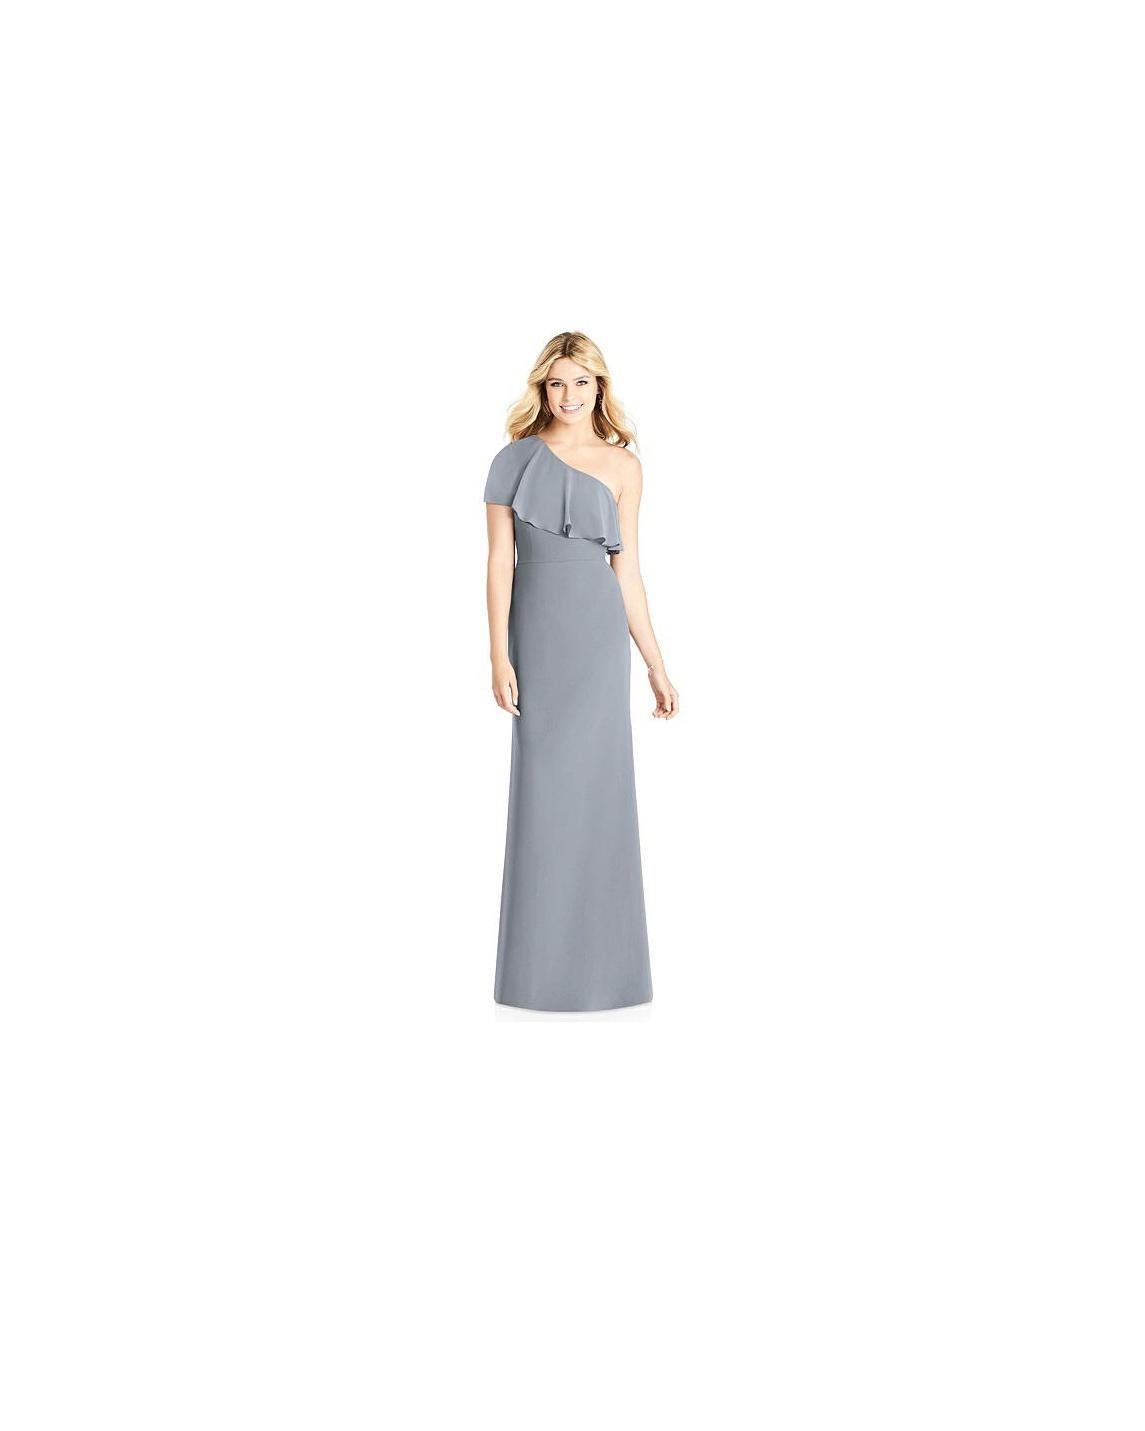 grey silver bridesmaid dresses social bridesmaids 8189 dress